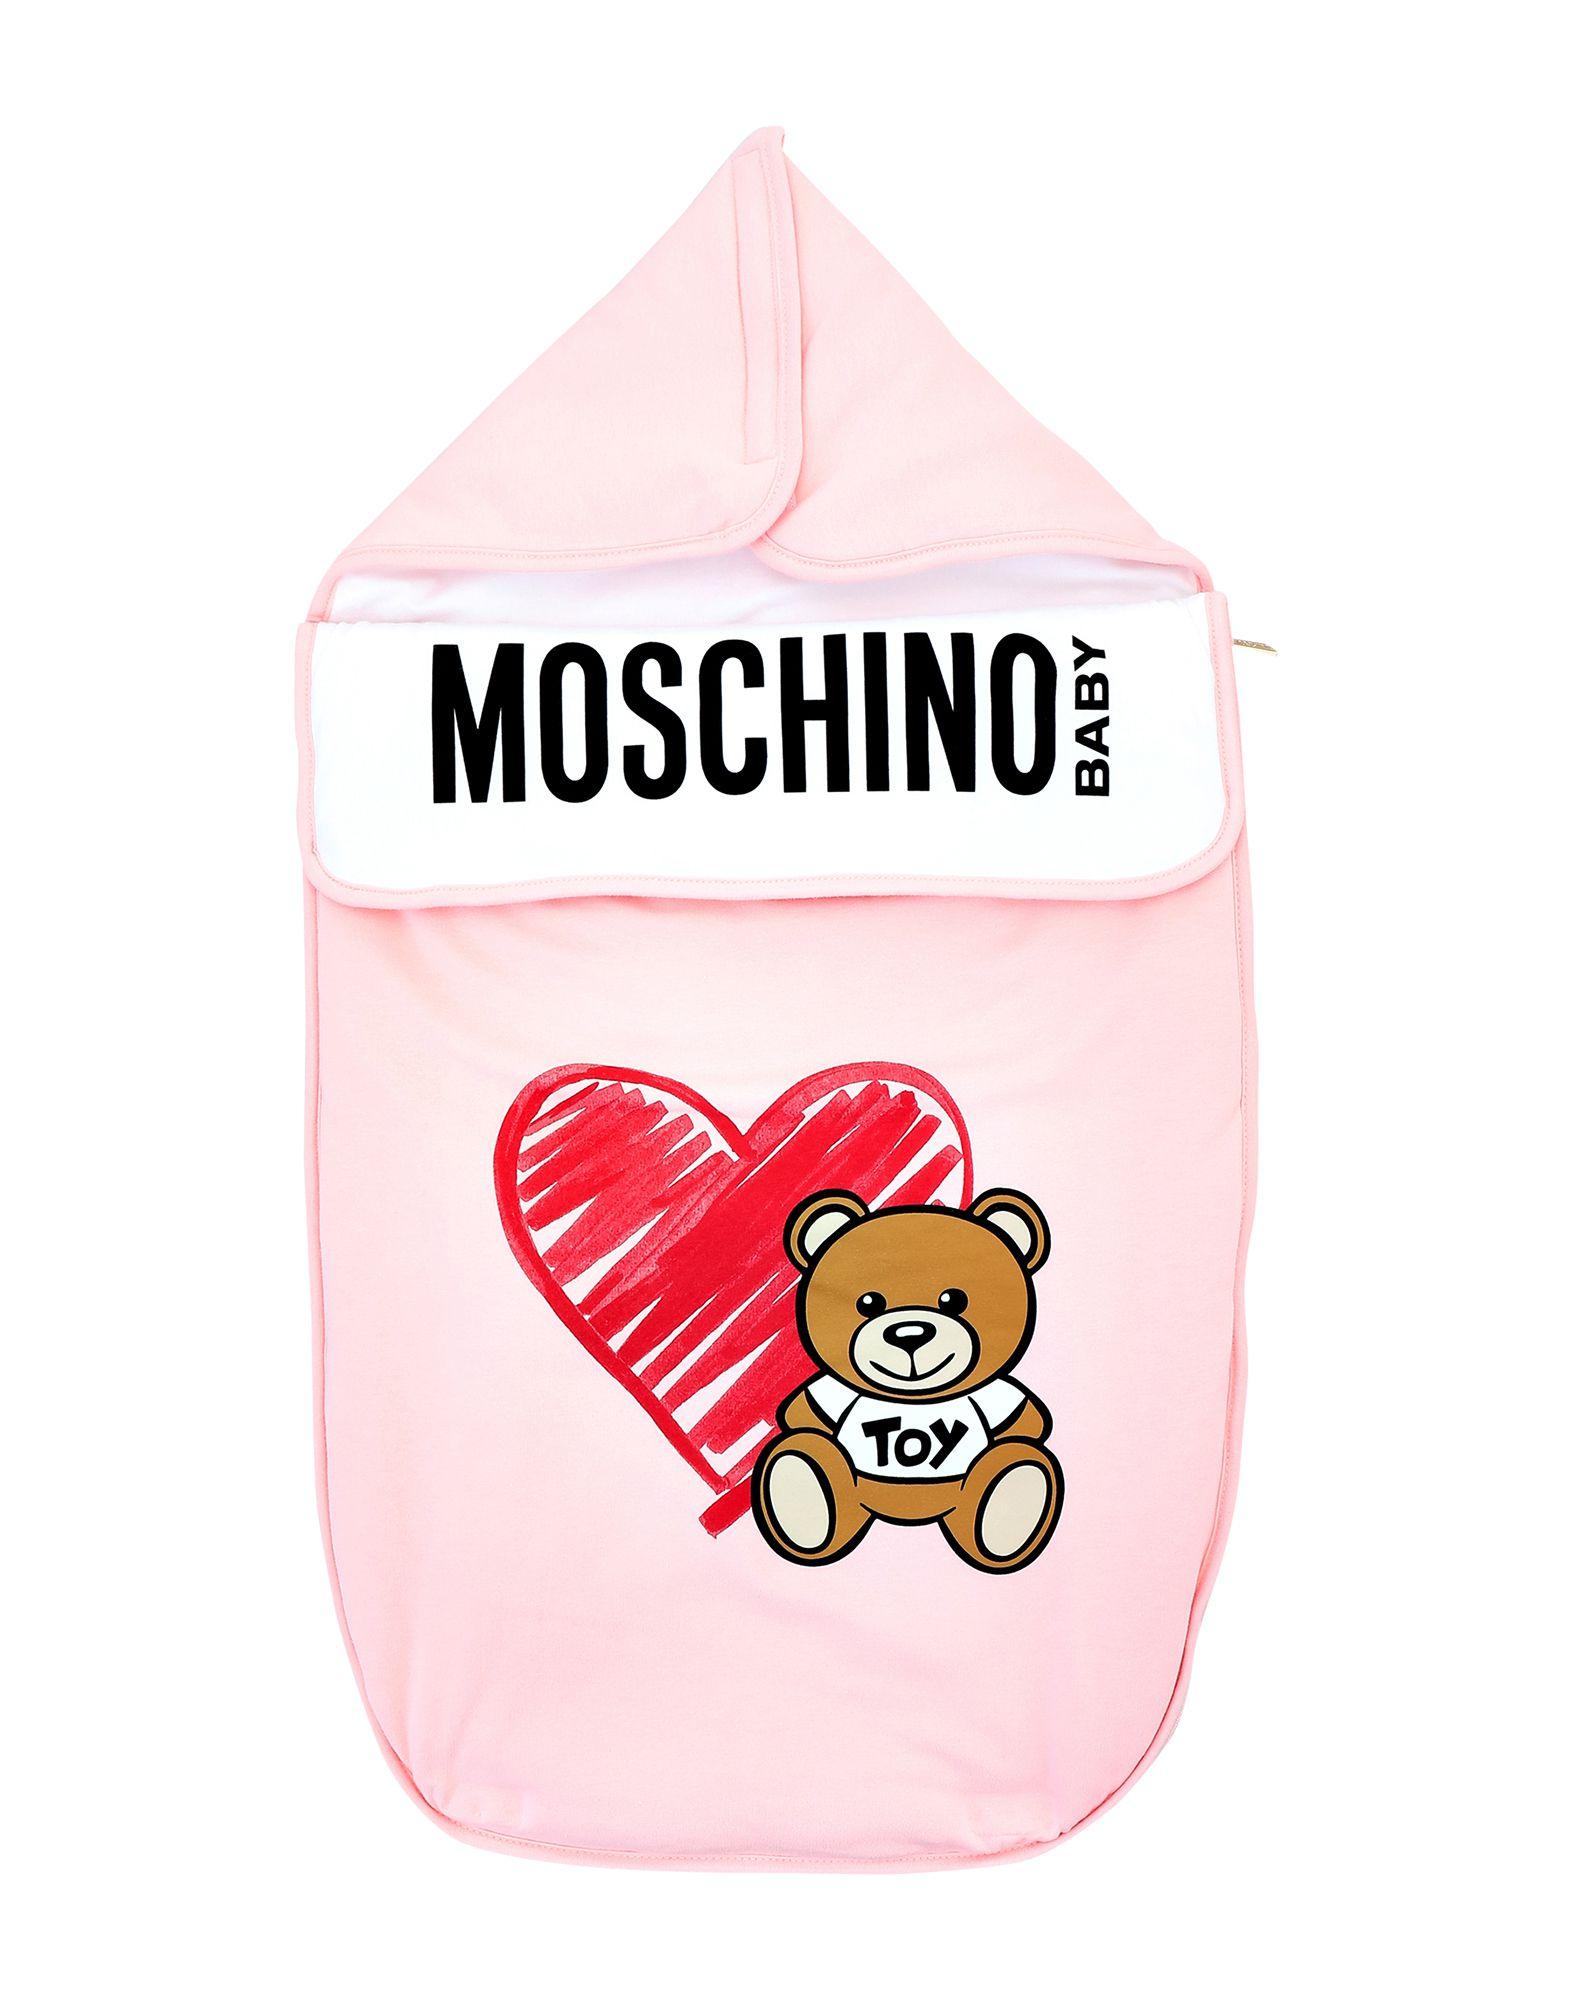 MOSCHINO Одеяльце для младенцев для младенцев подарок